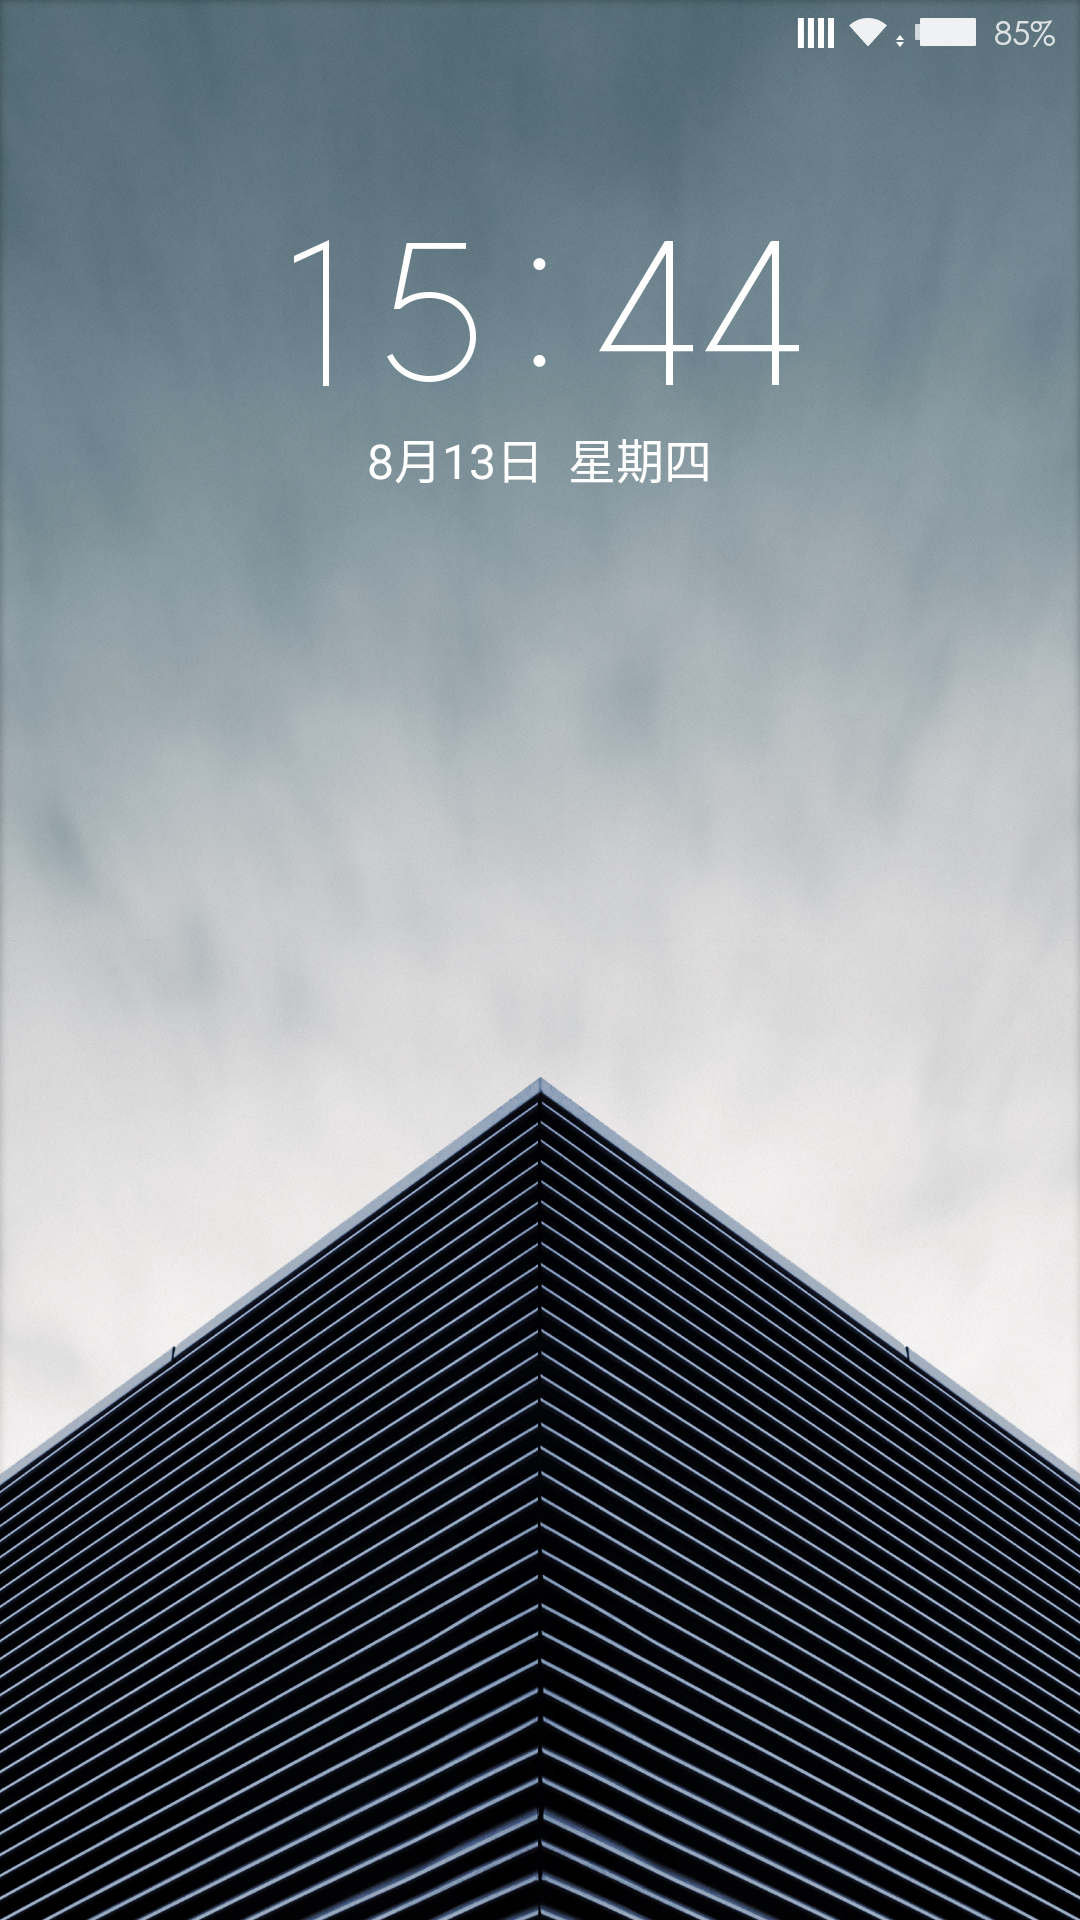 Screenshot_2015-08-13-15-44-28[1].png